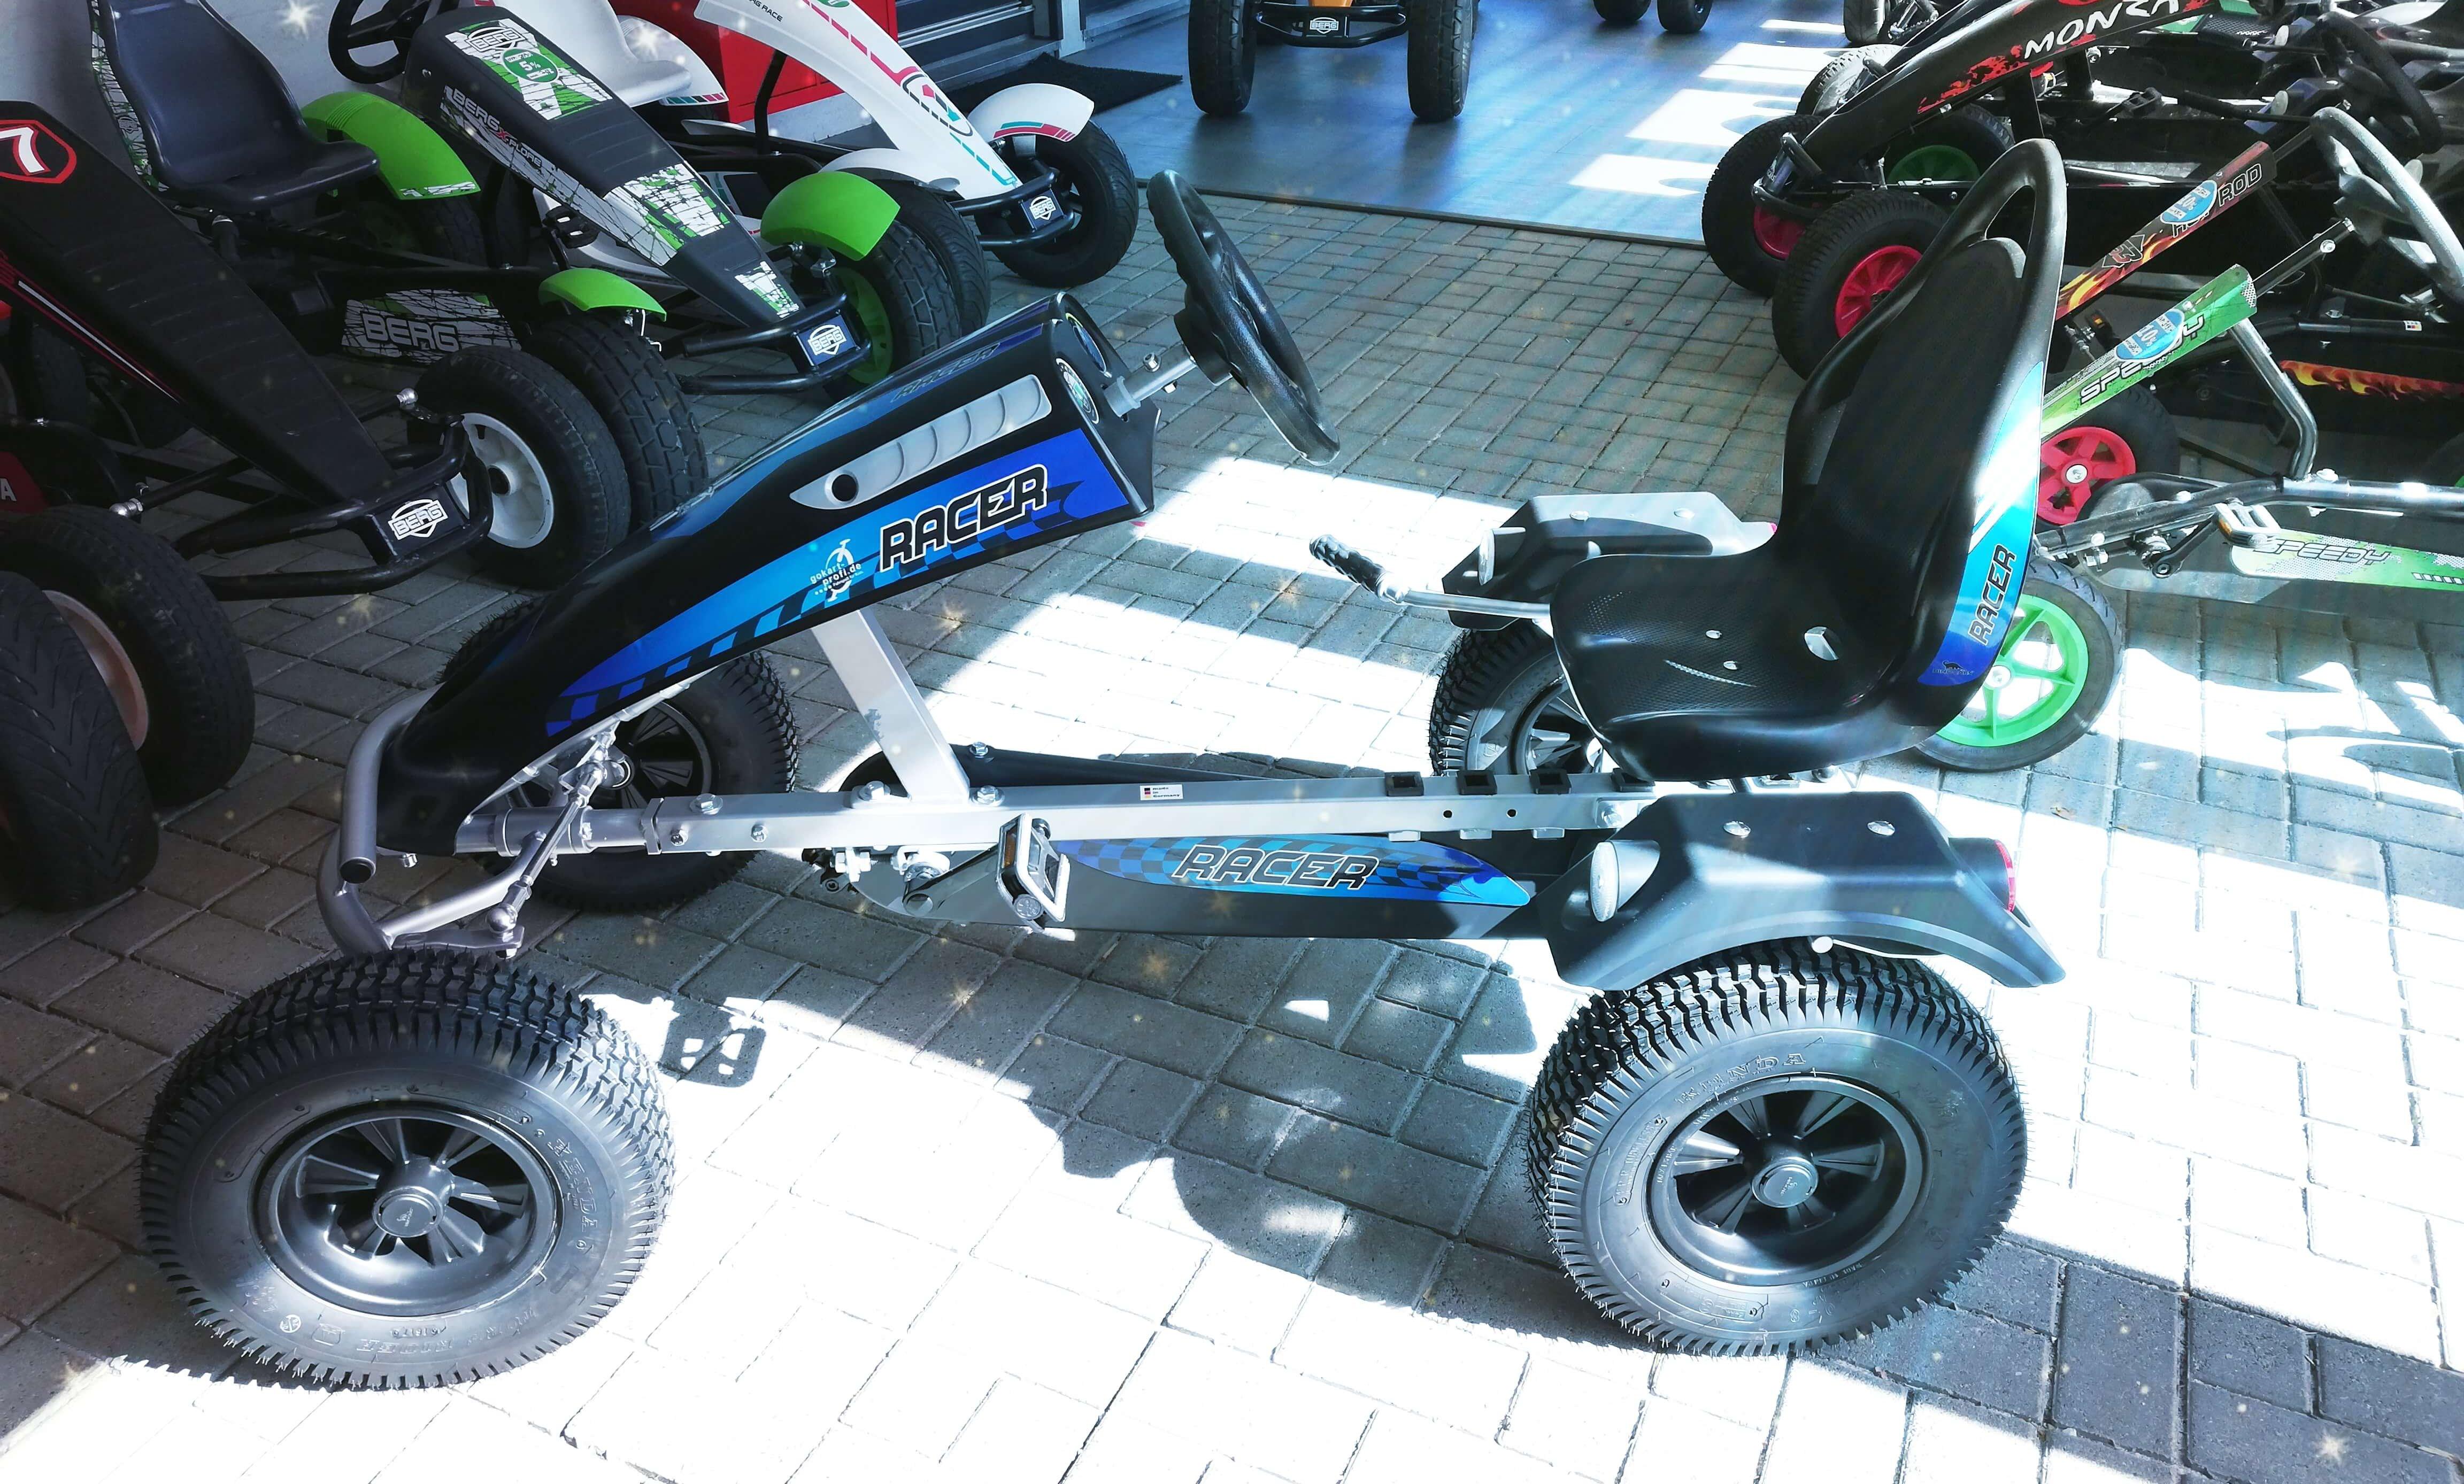 DINO CARS Silver Racer - Sondermodell gokart-profi.de